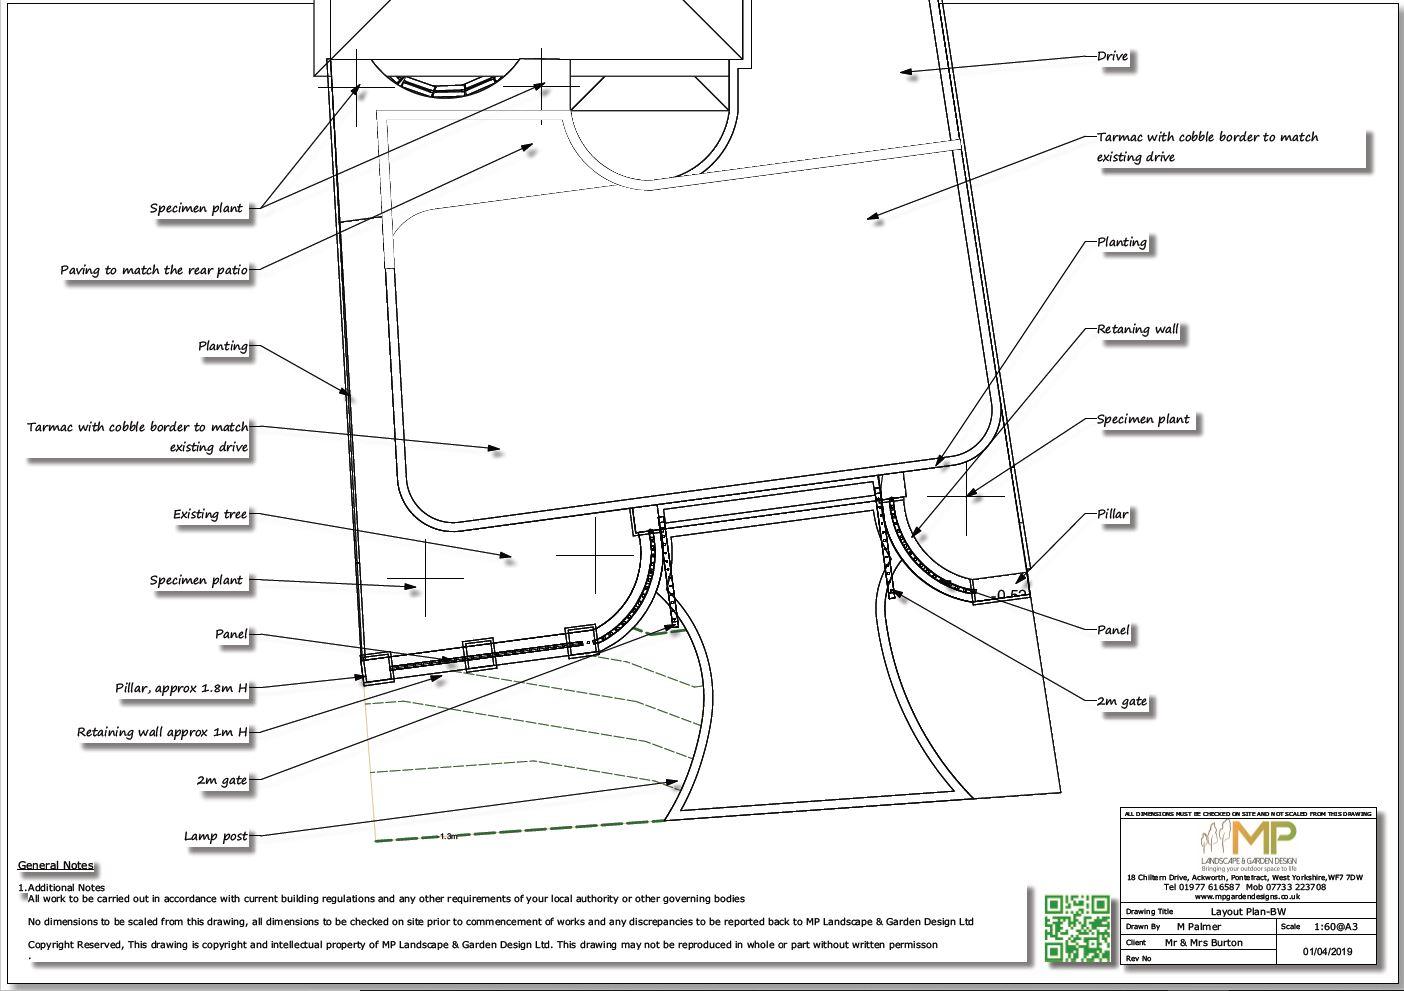 Black and white arden design plans, Ackworth.